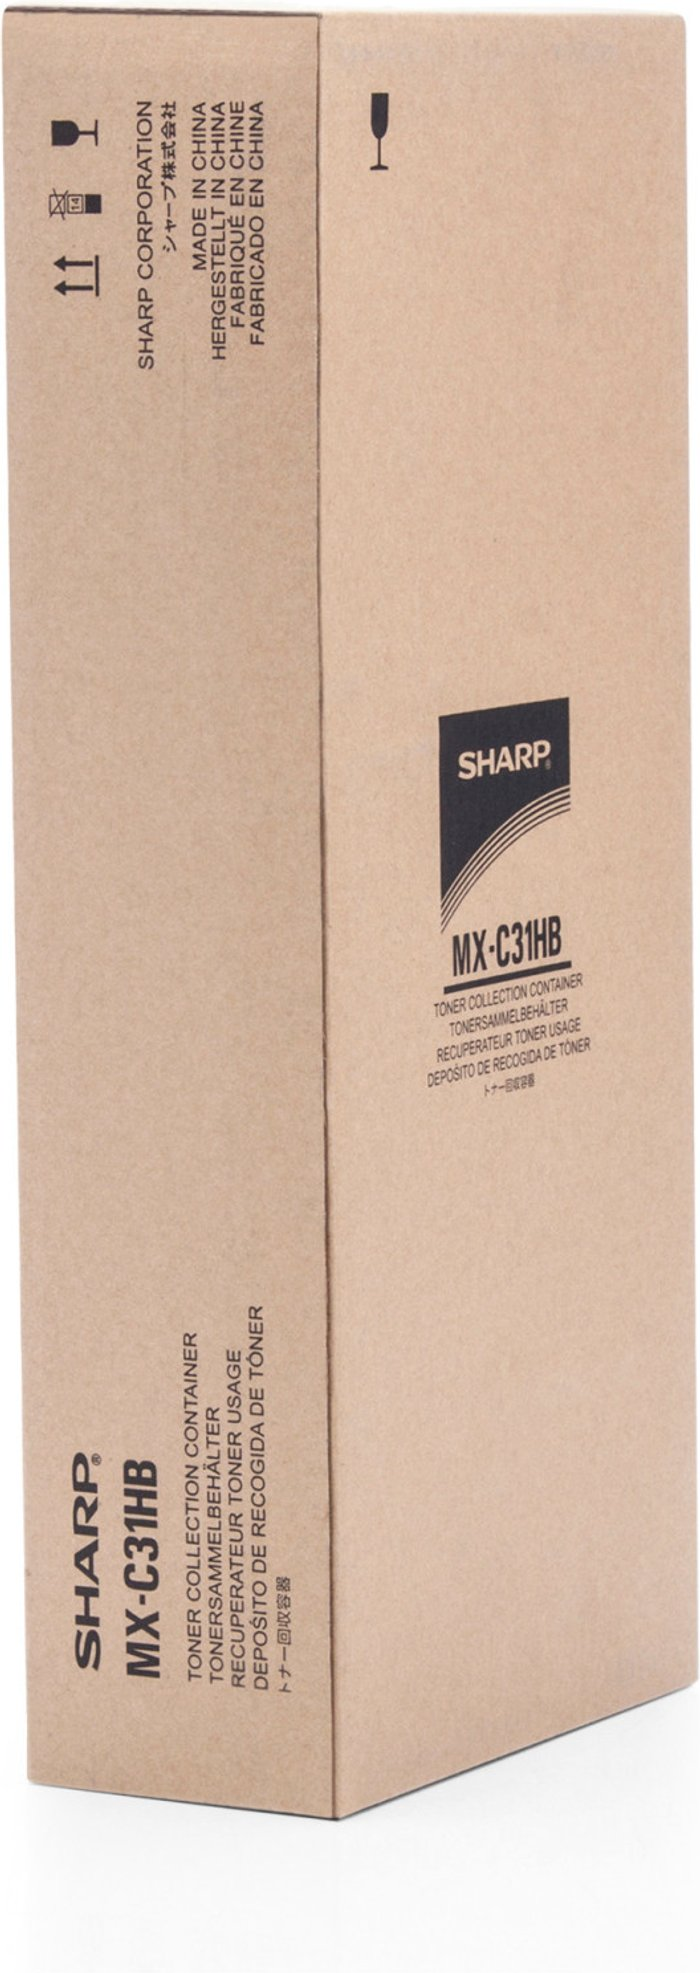 Sharp Sharp MX-C31HB